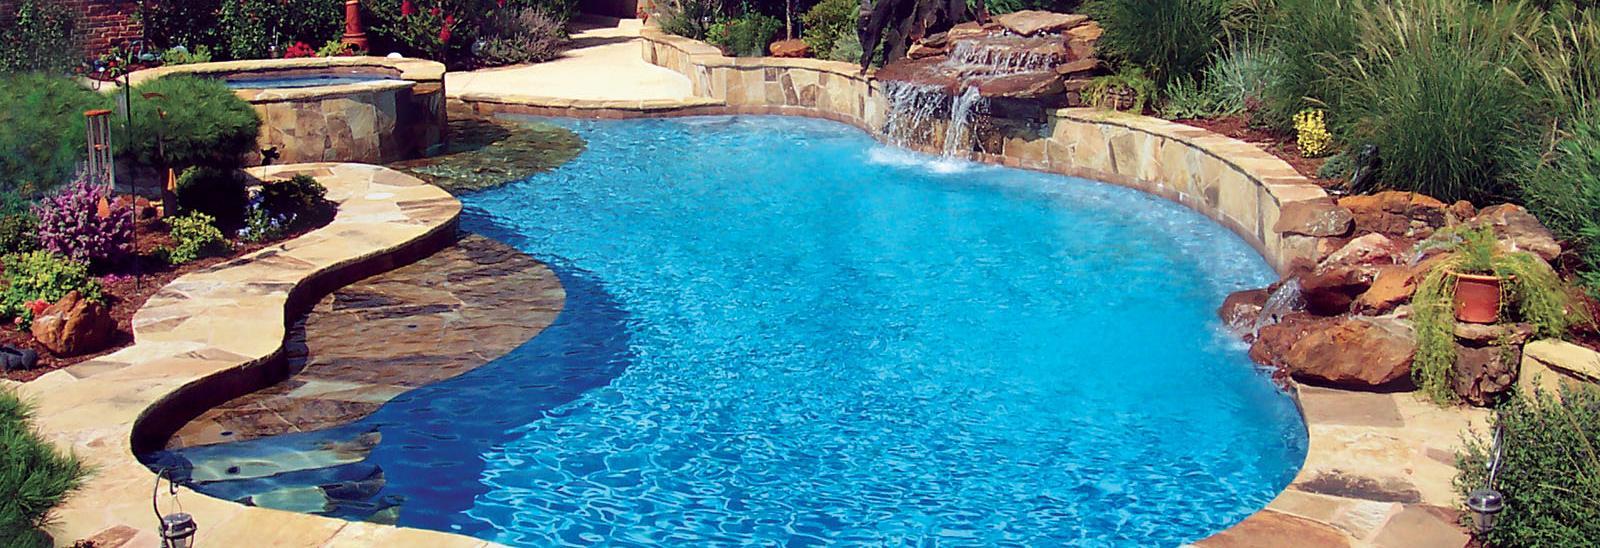 Blue Haven Pools & Spas in Flowood, MS banner